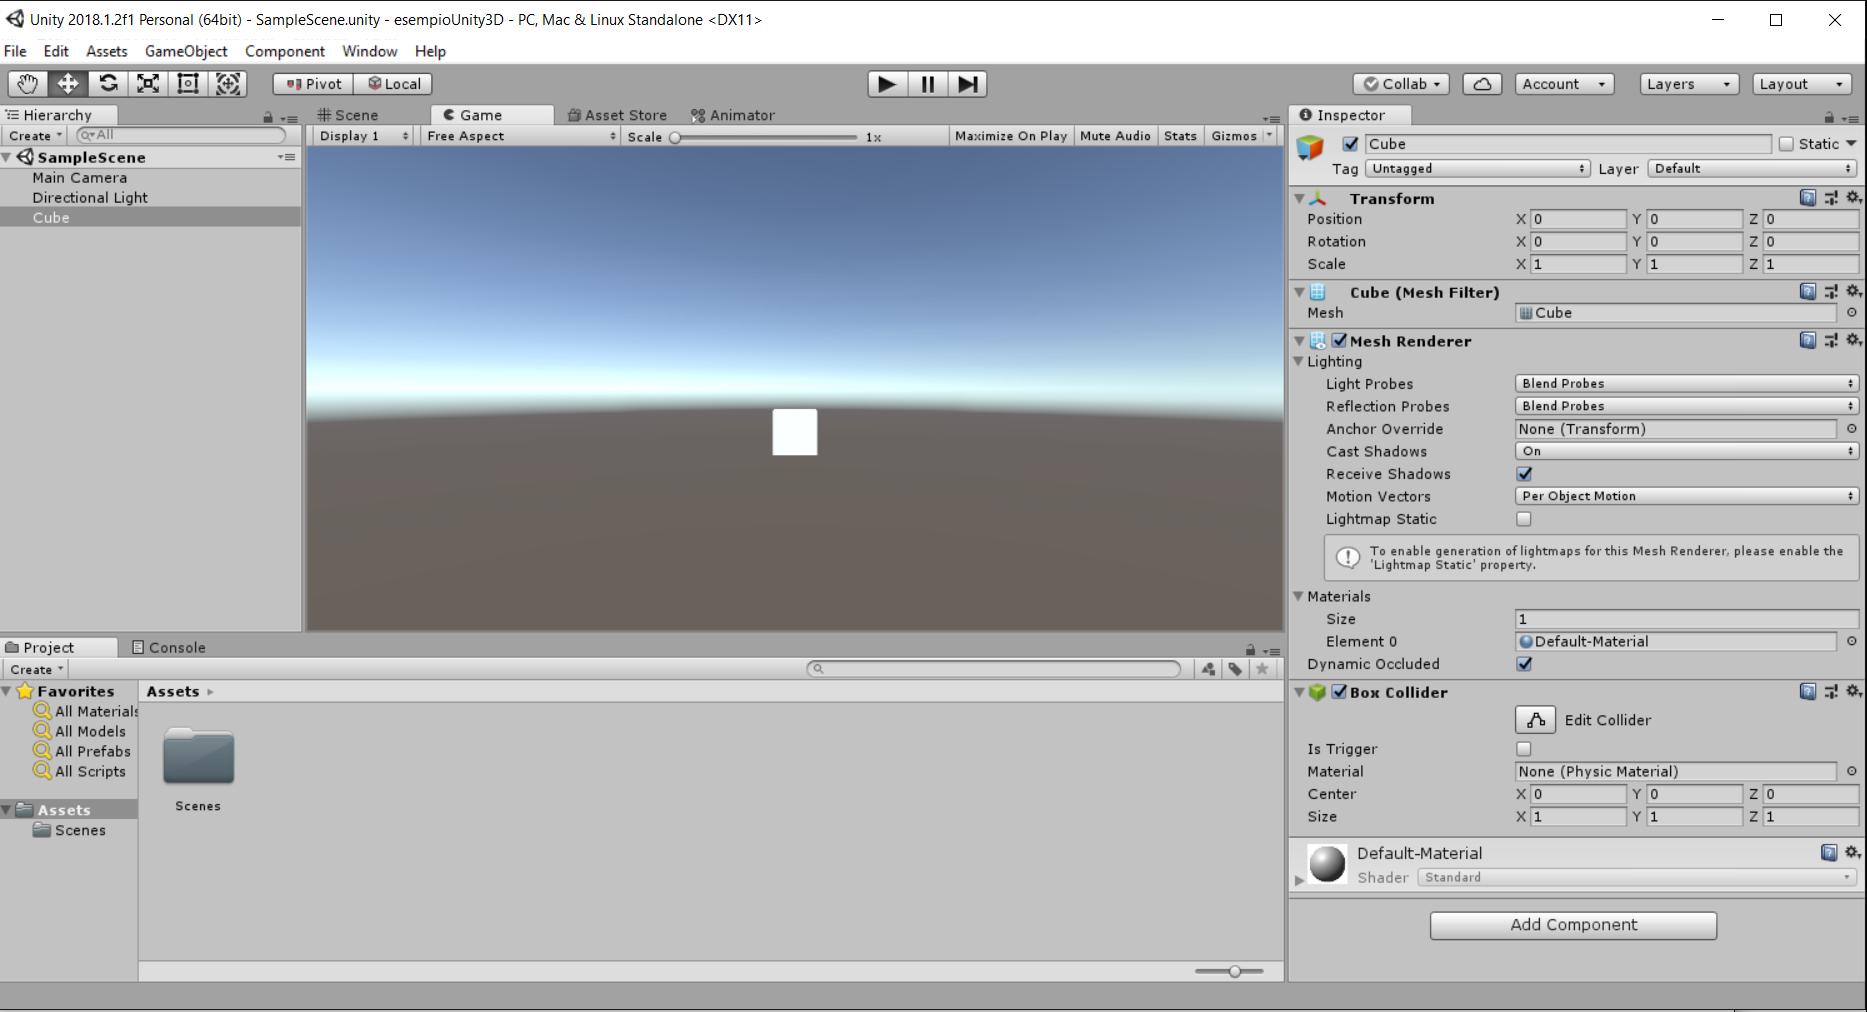 Unity Editor window